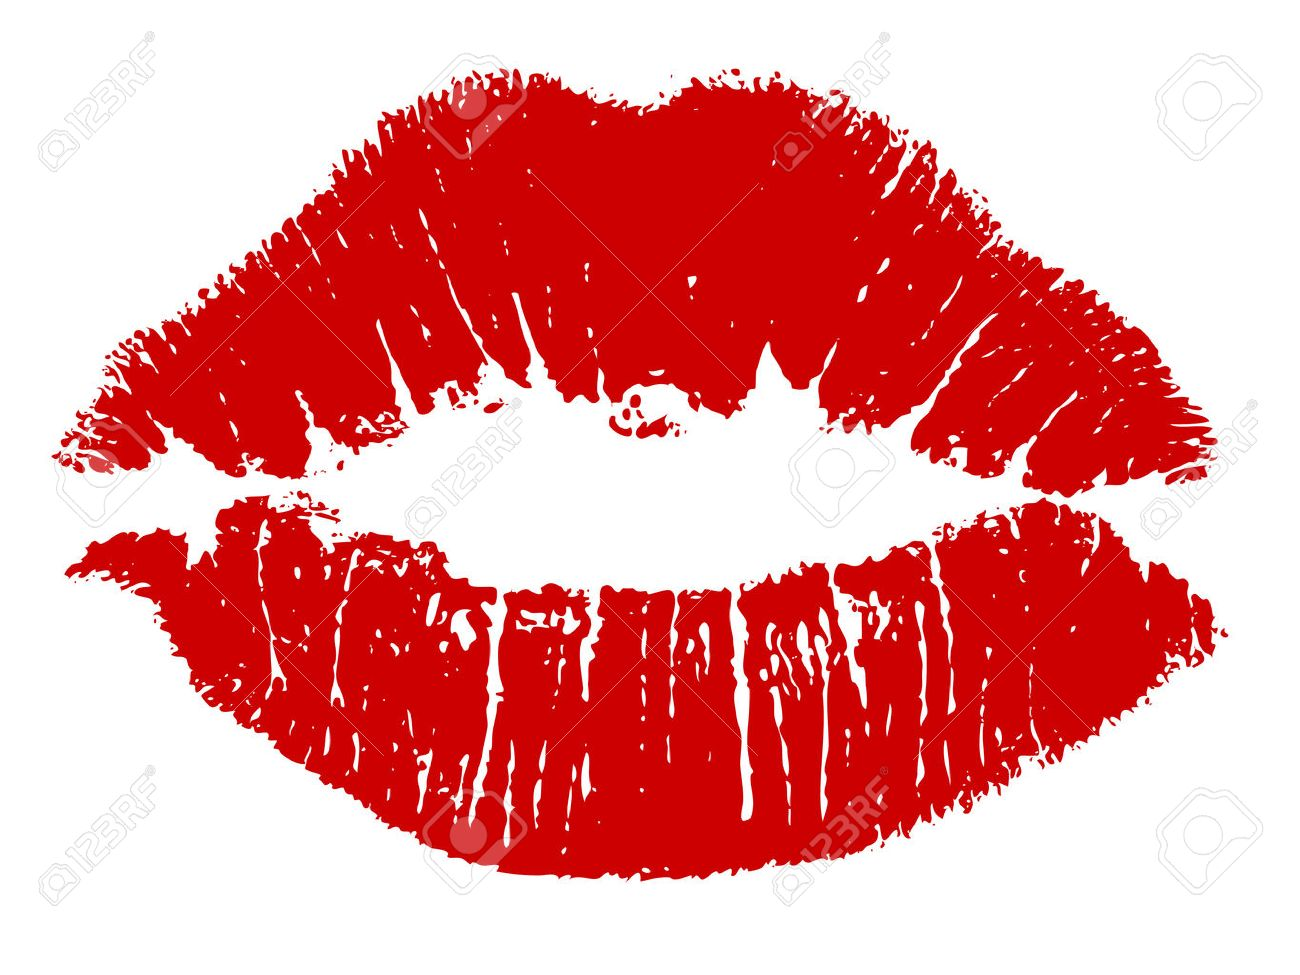 red kiss lips vector royalty free cliparts vectors and stock rh 123rf com lips vector freepik lips vector free download